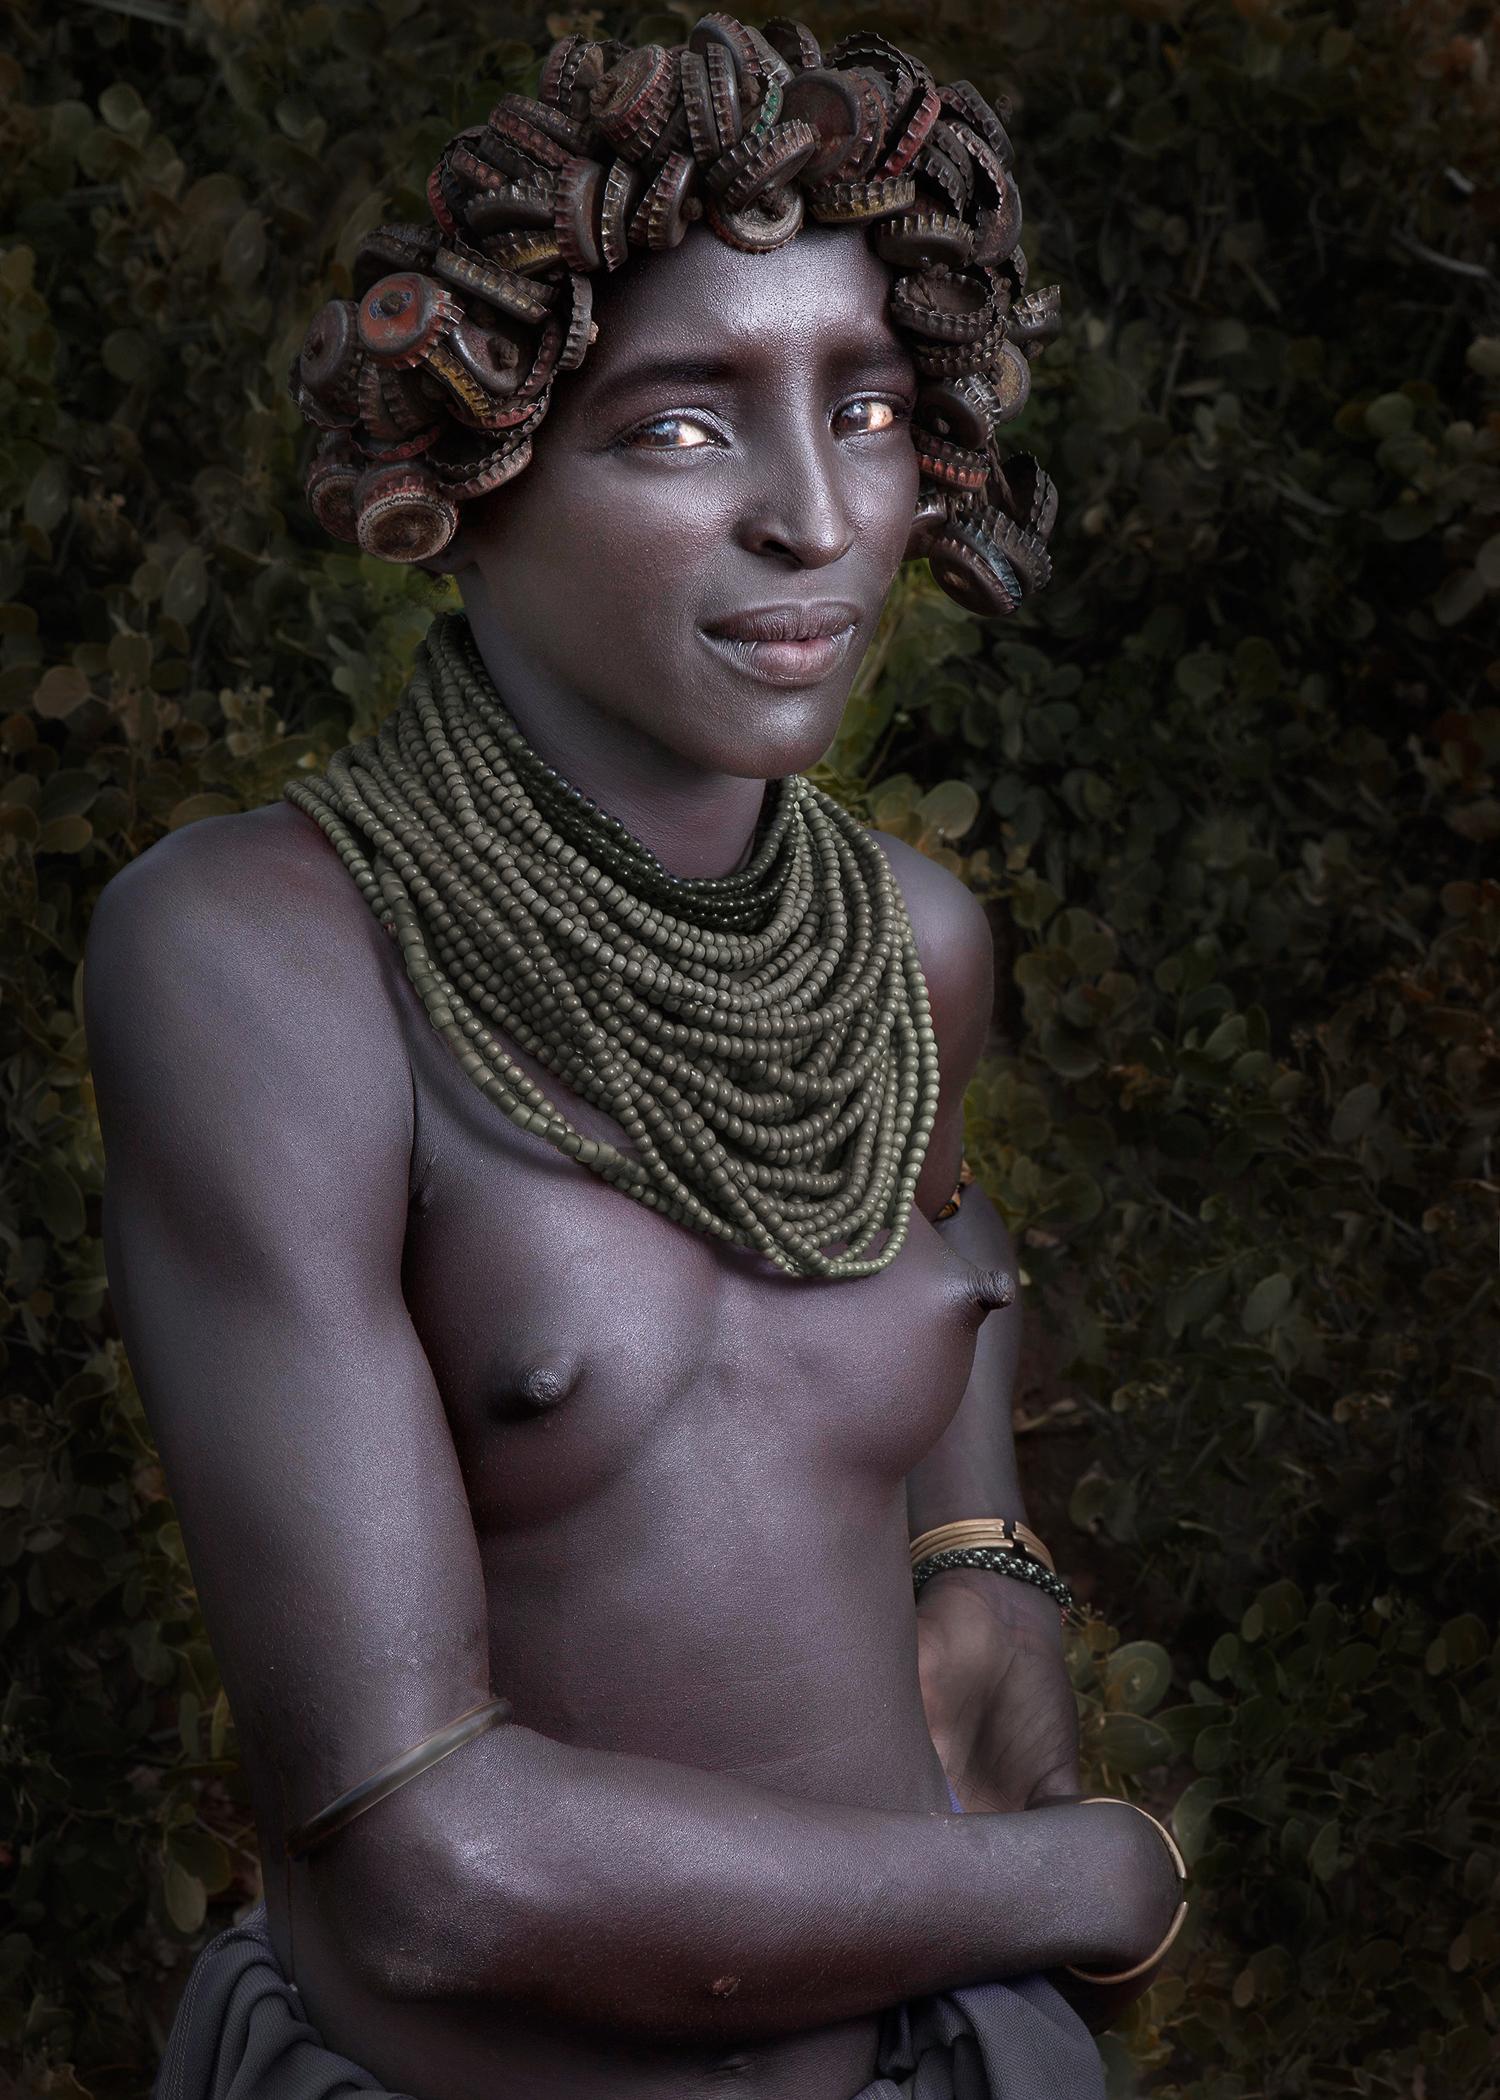 William Ropp, Ethiopie, 2014. Digital inkjet print, 40 x 60 centimeters. Courtesy of the artist